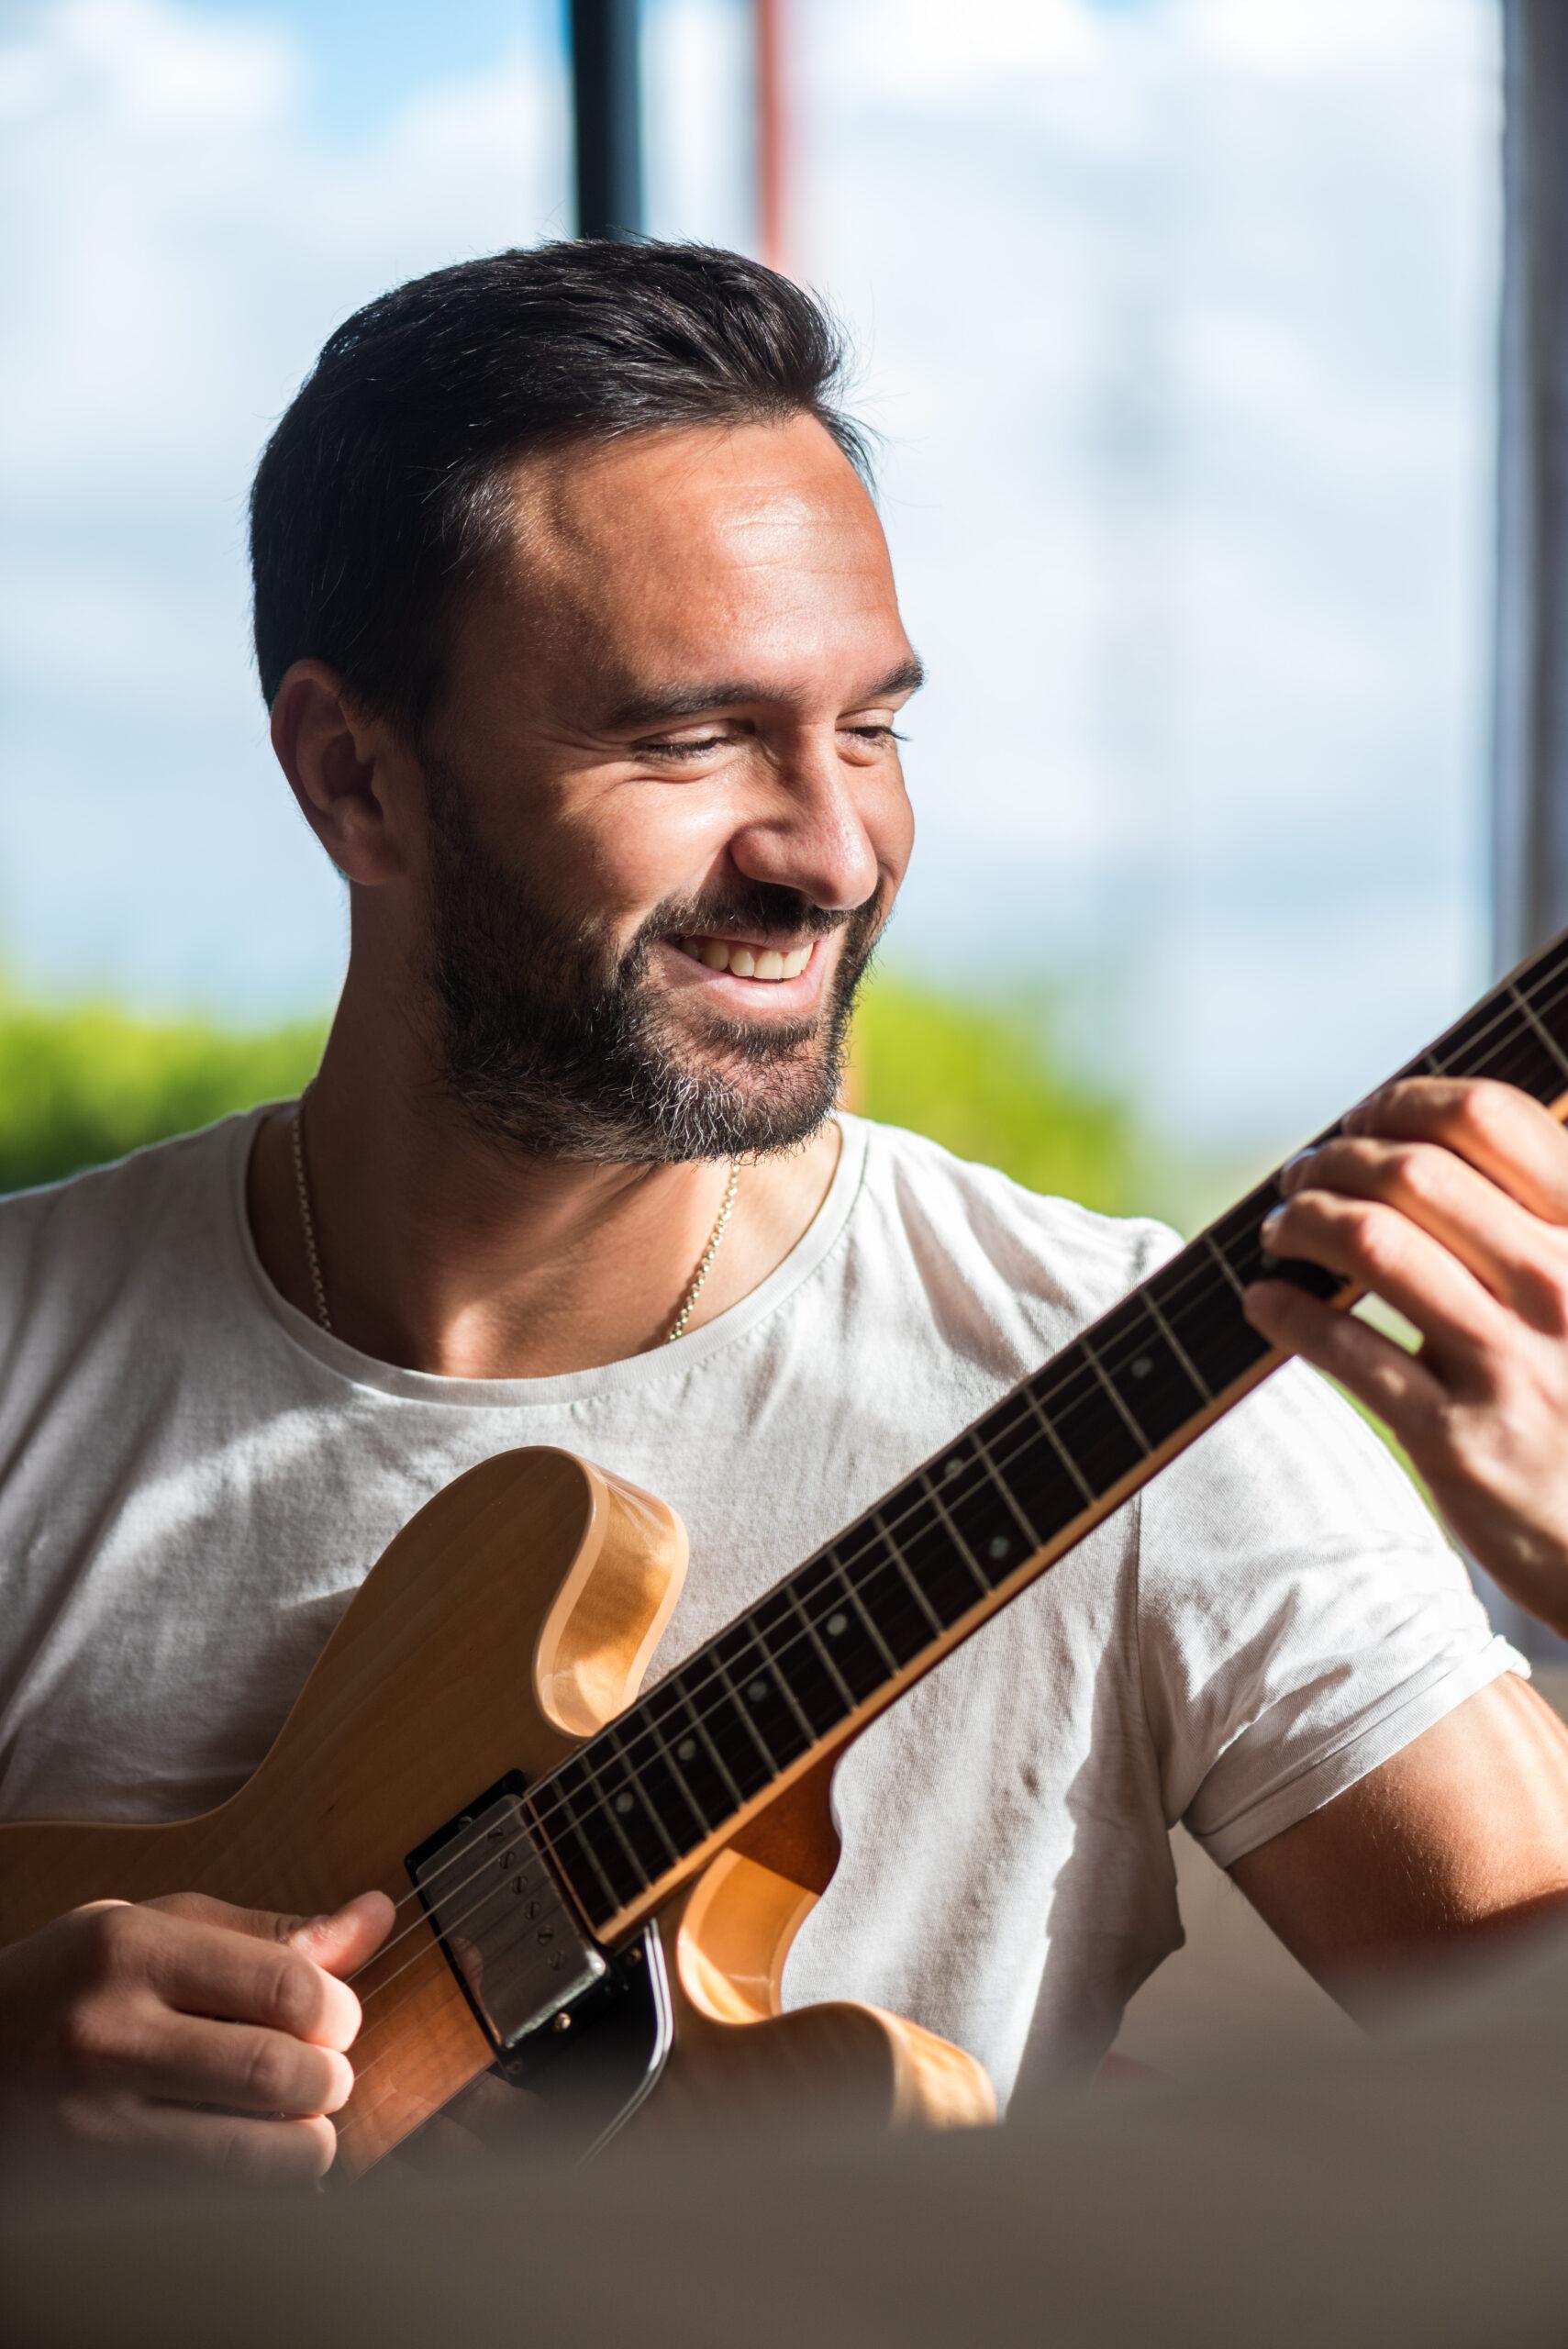 Mallorcan guitarist